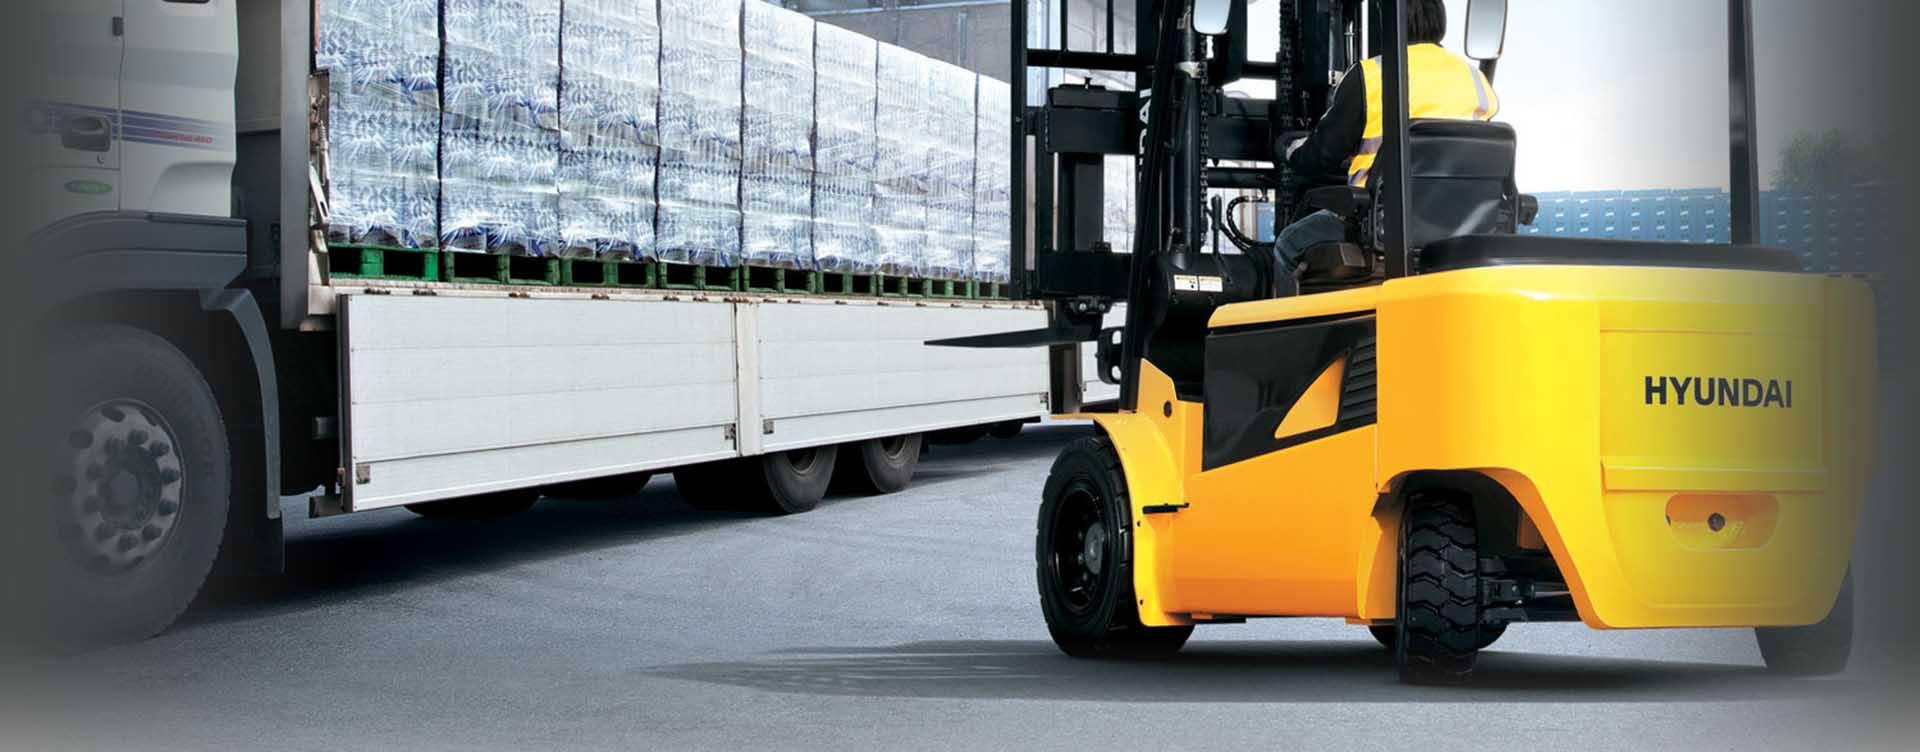 Monroe Truck Equipment >> Statesville Forklifts - Hyundai, UniCarriers, Komatsu | Carolina Industrial Trucks